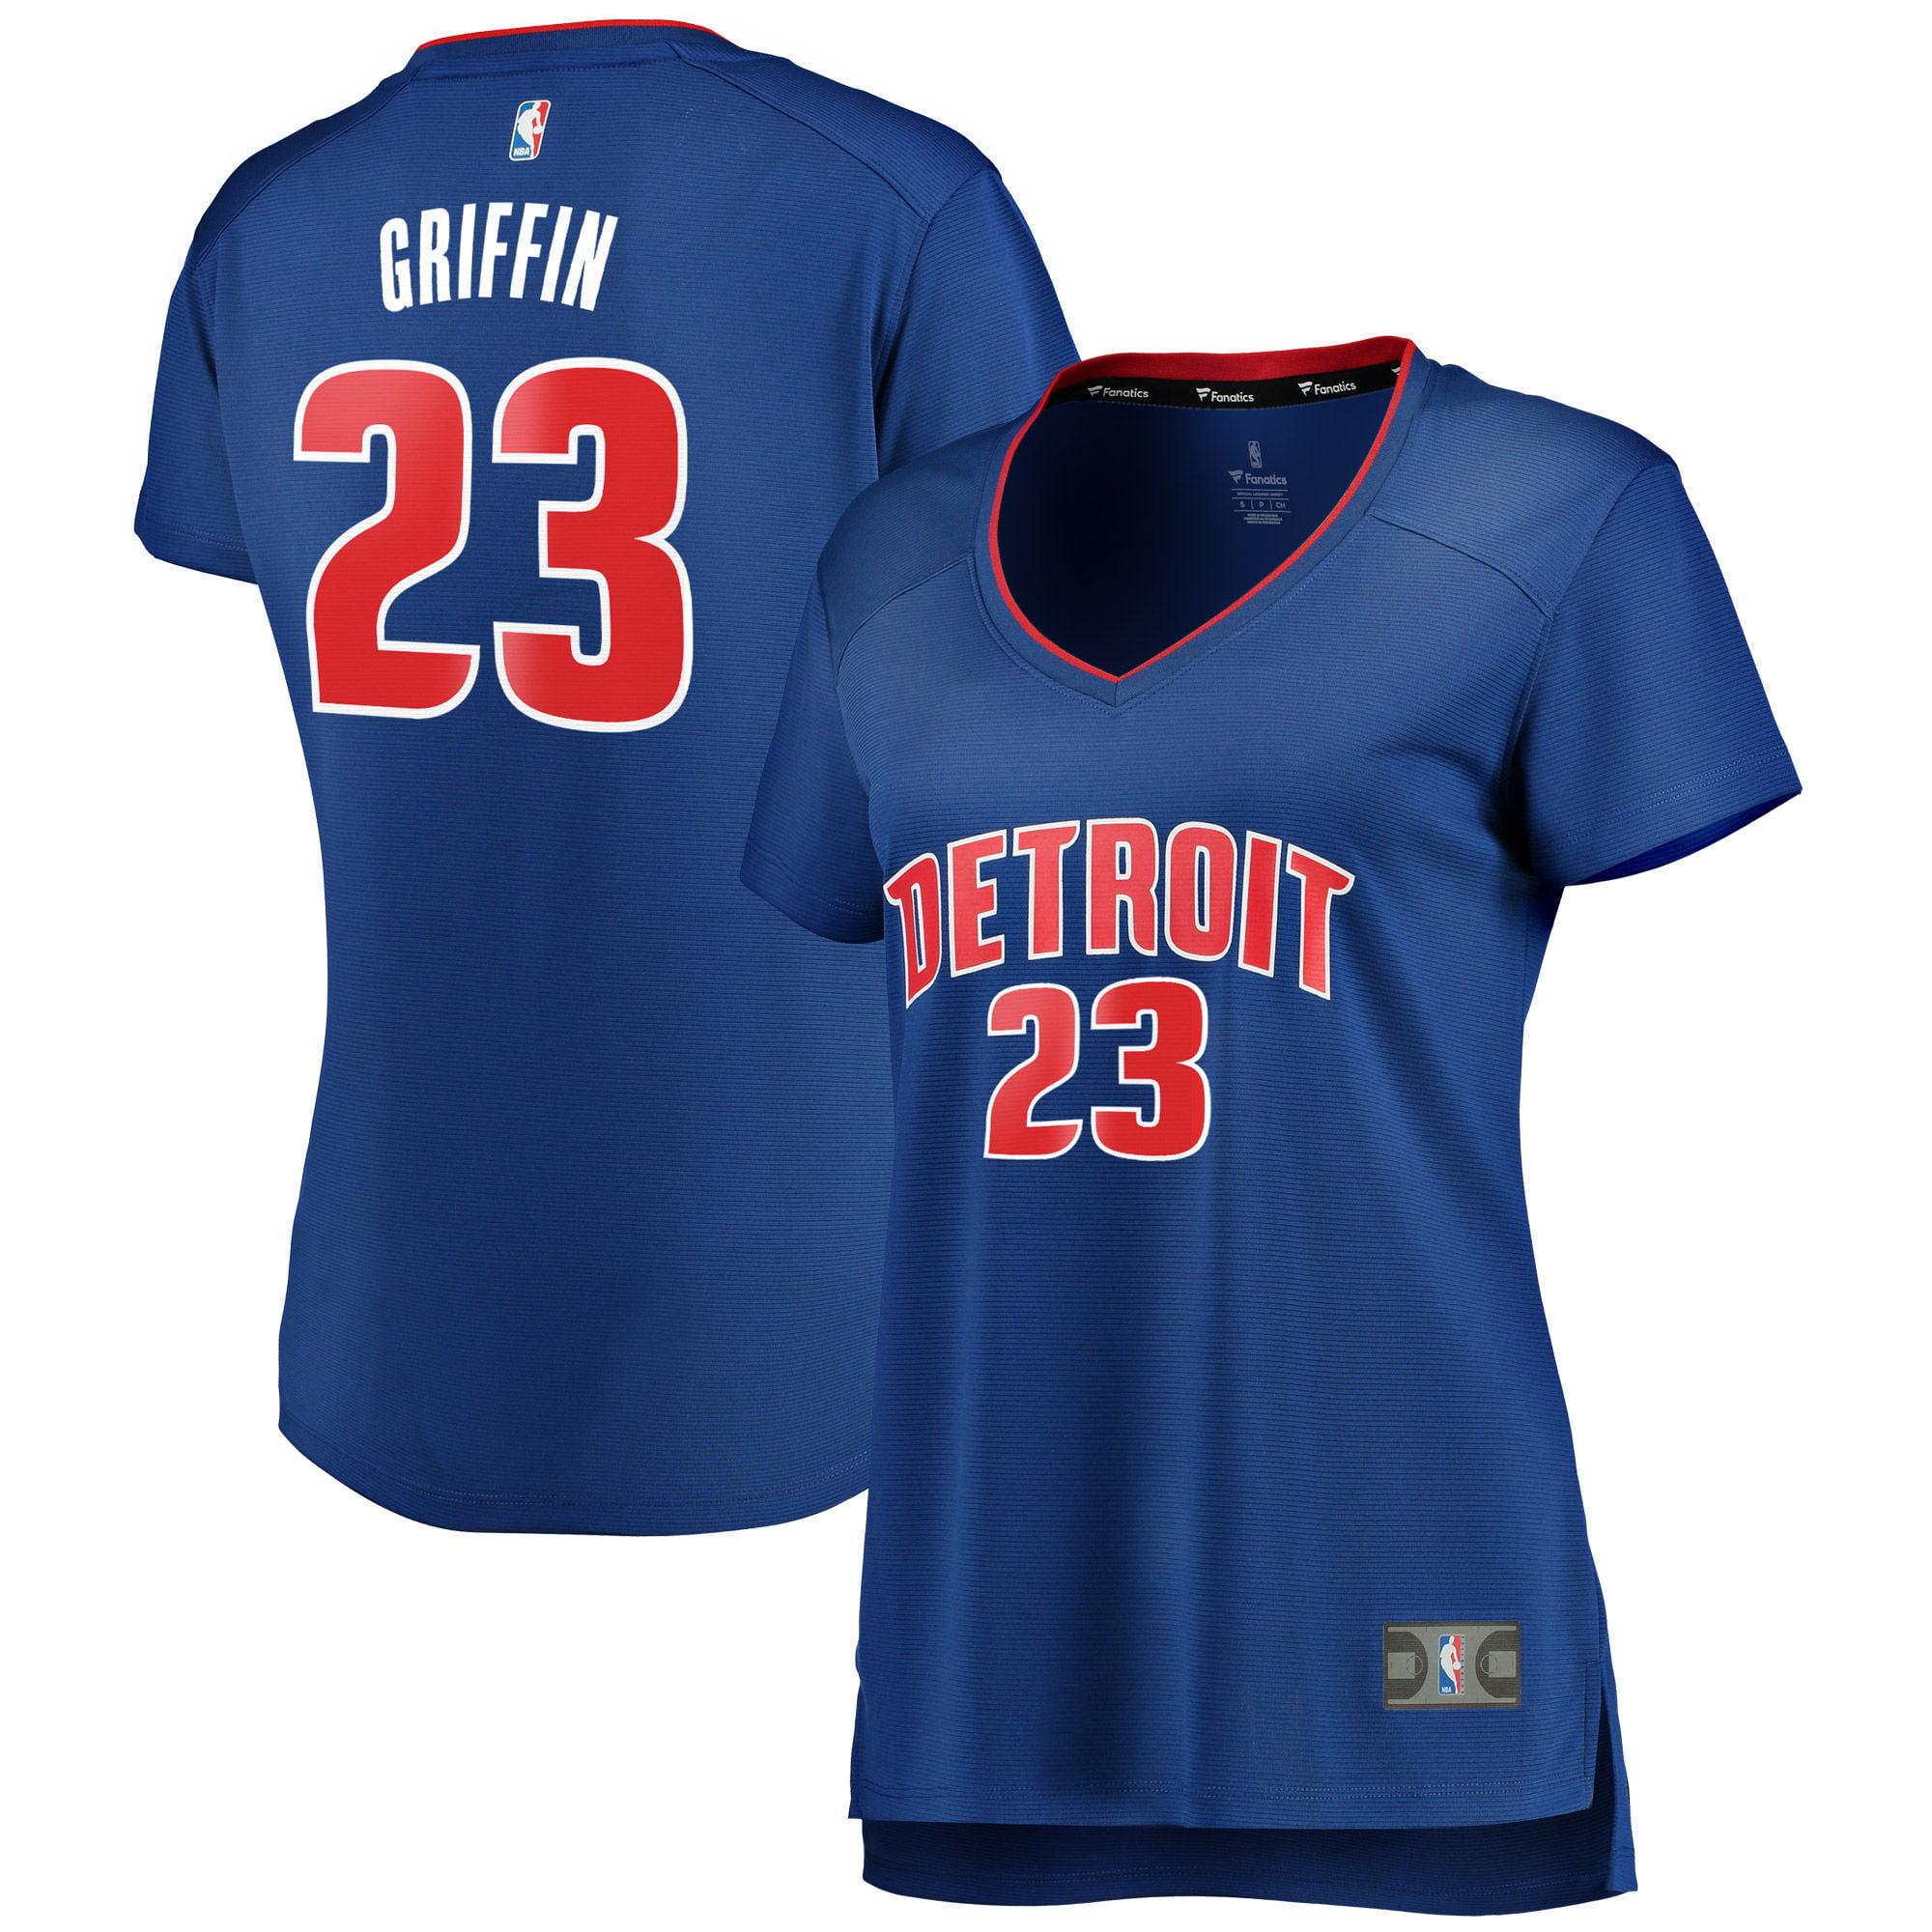 Blake Griffin Detroit Pistons Fanatics Branded Women's Fast Break Replica Jersey Blue - Icon Edition